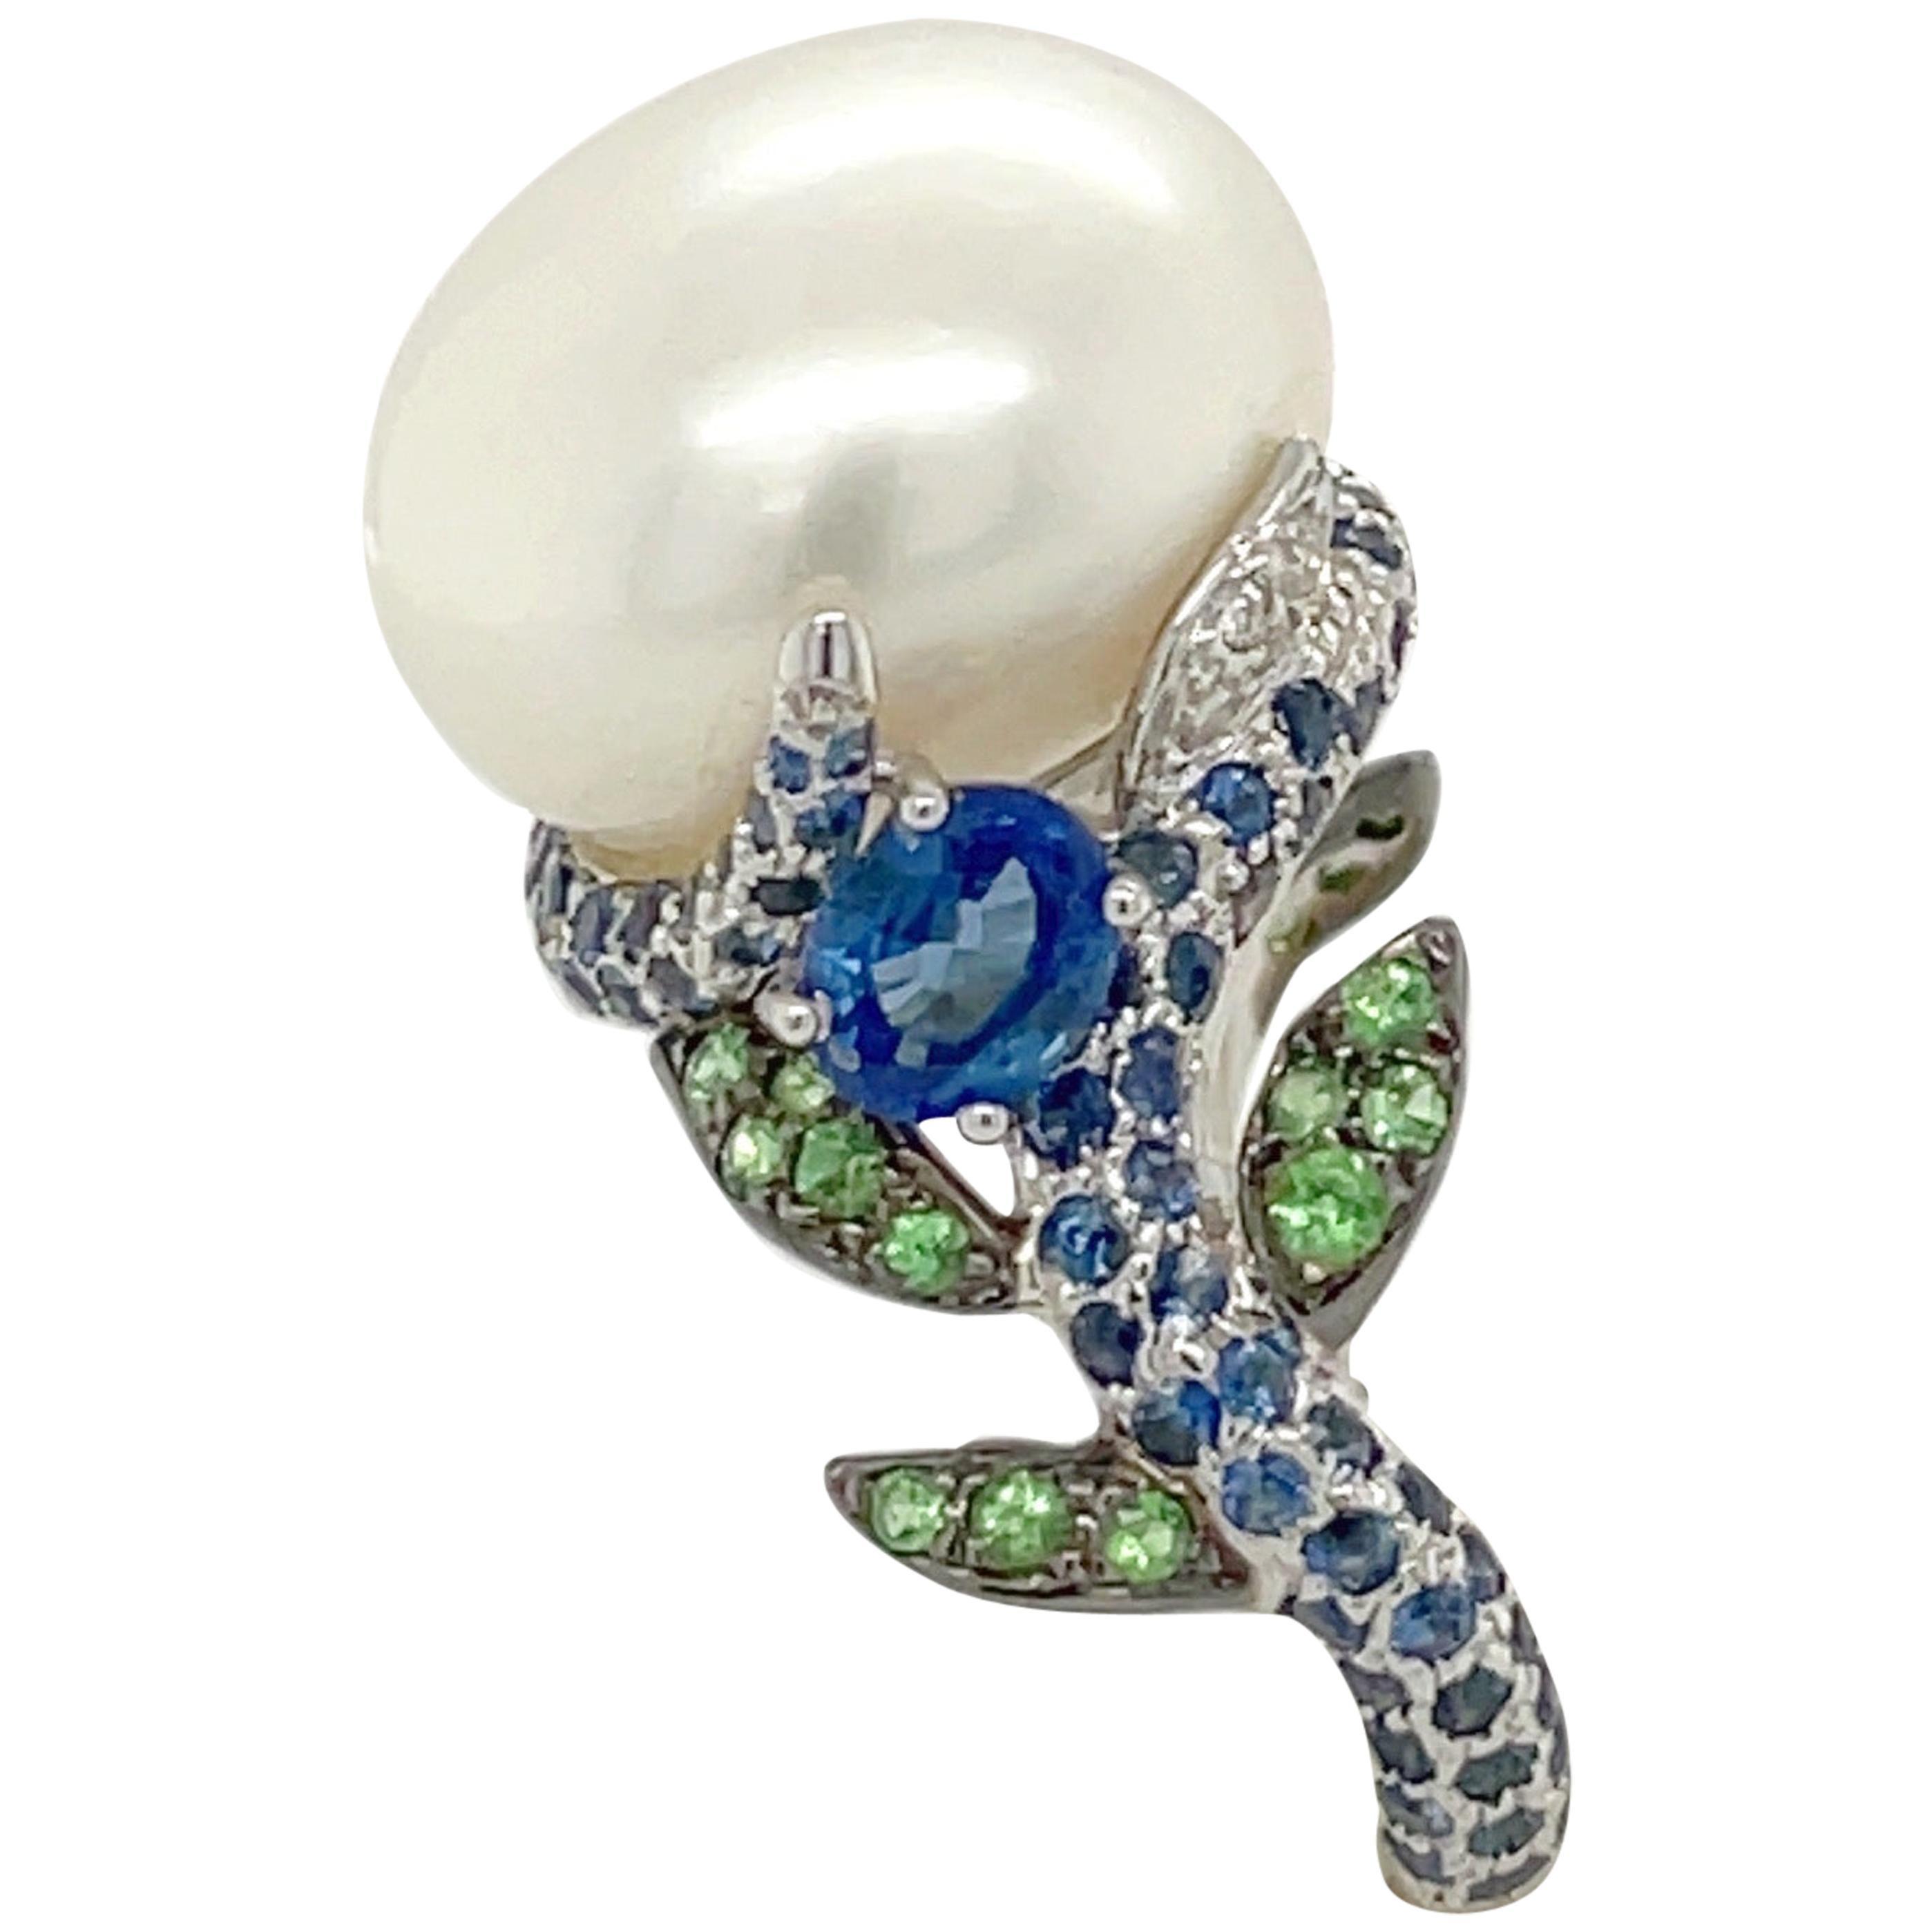 18 Karat White Gold Pearl, Diamond, 2.08 Carat Blue Sapphire and Tsavorite Ring